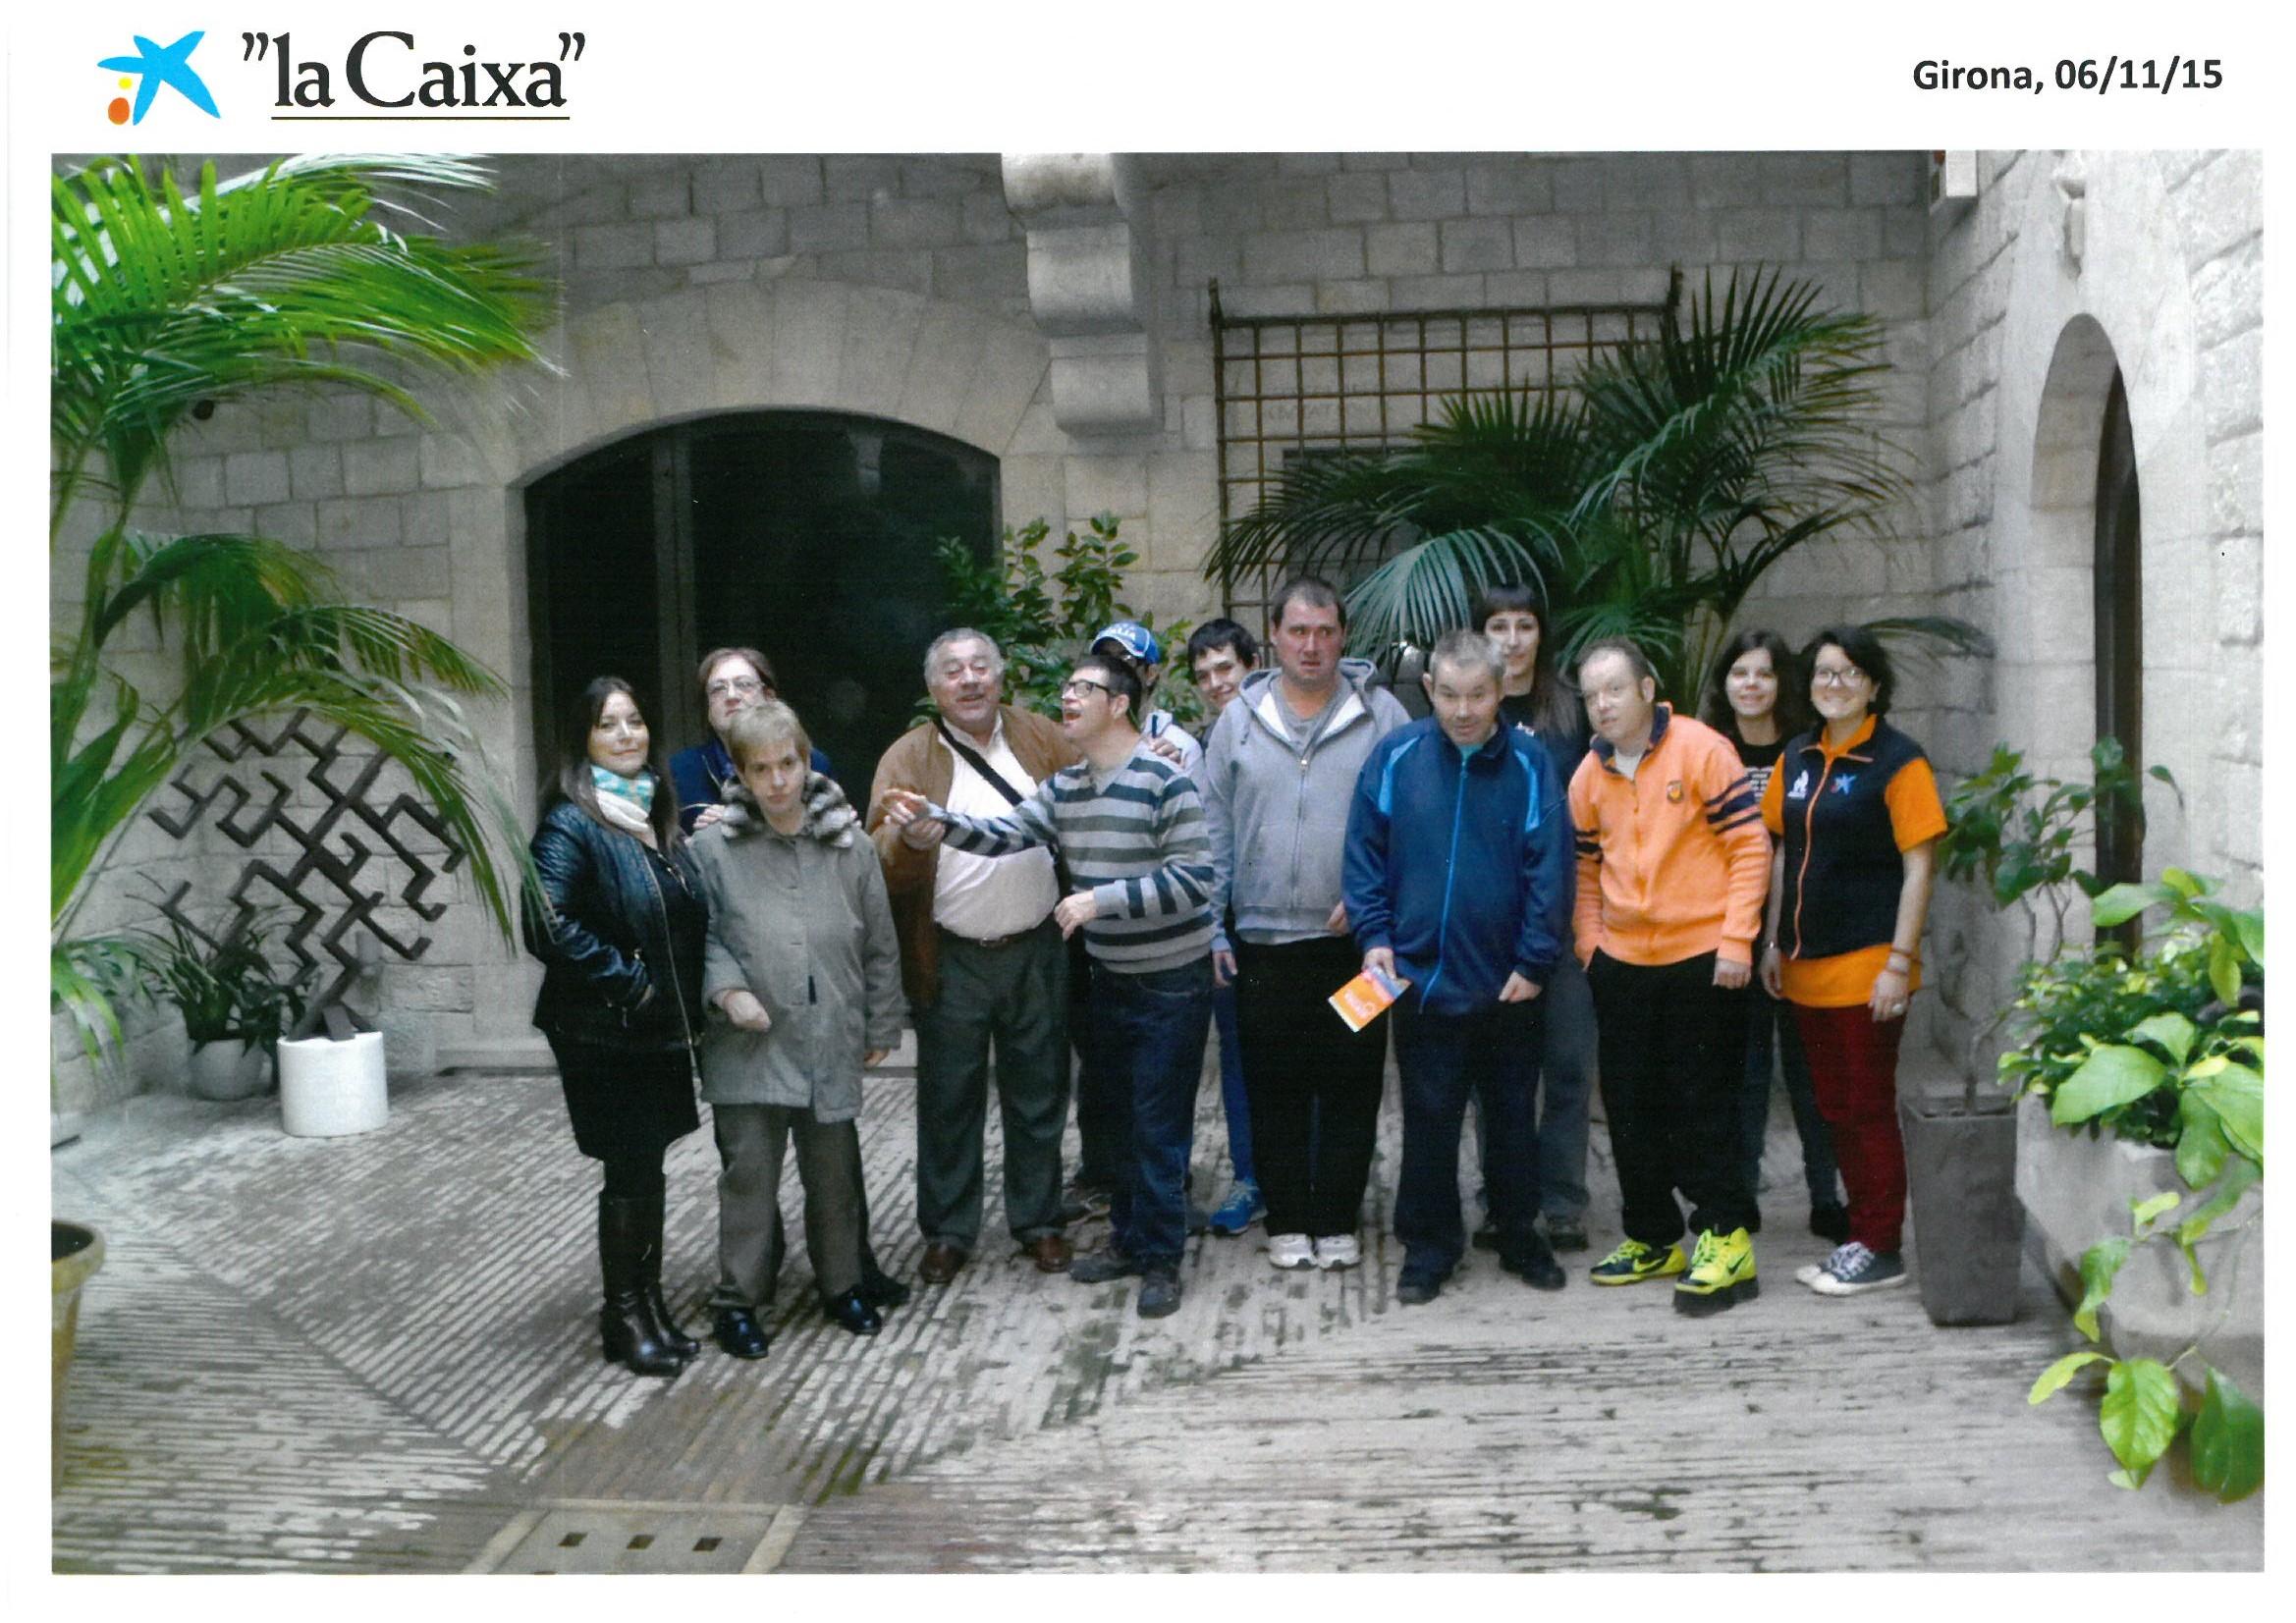 Visita a CaixaForum